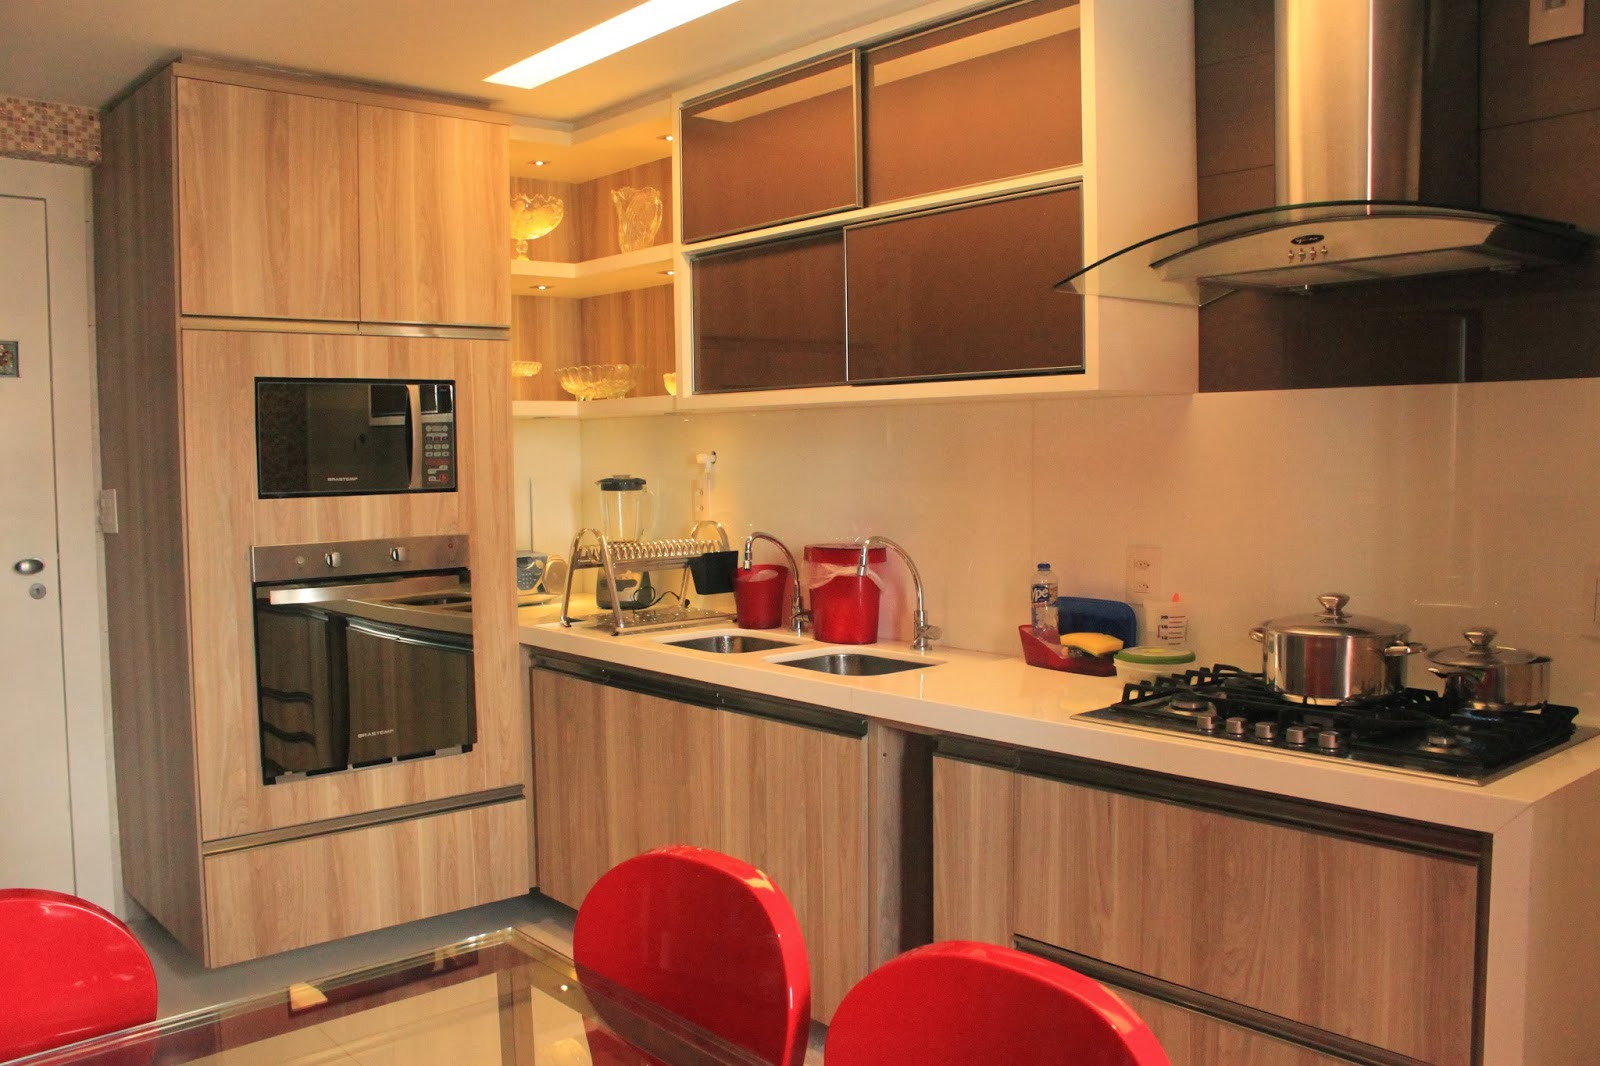 Rafaella lousada apartamento m f for Muebles de cocina americana fotos